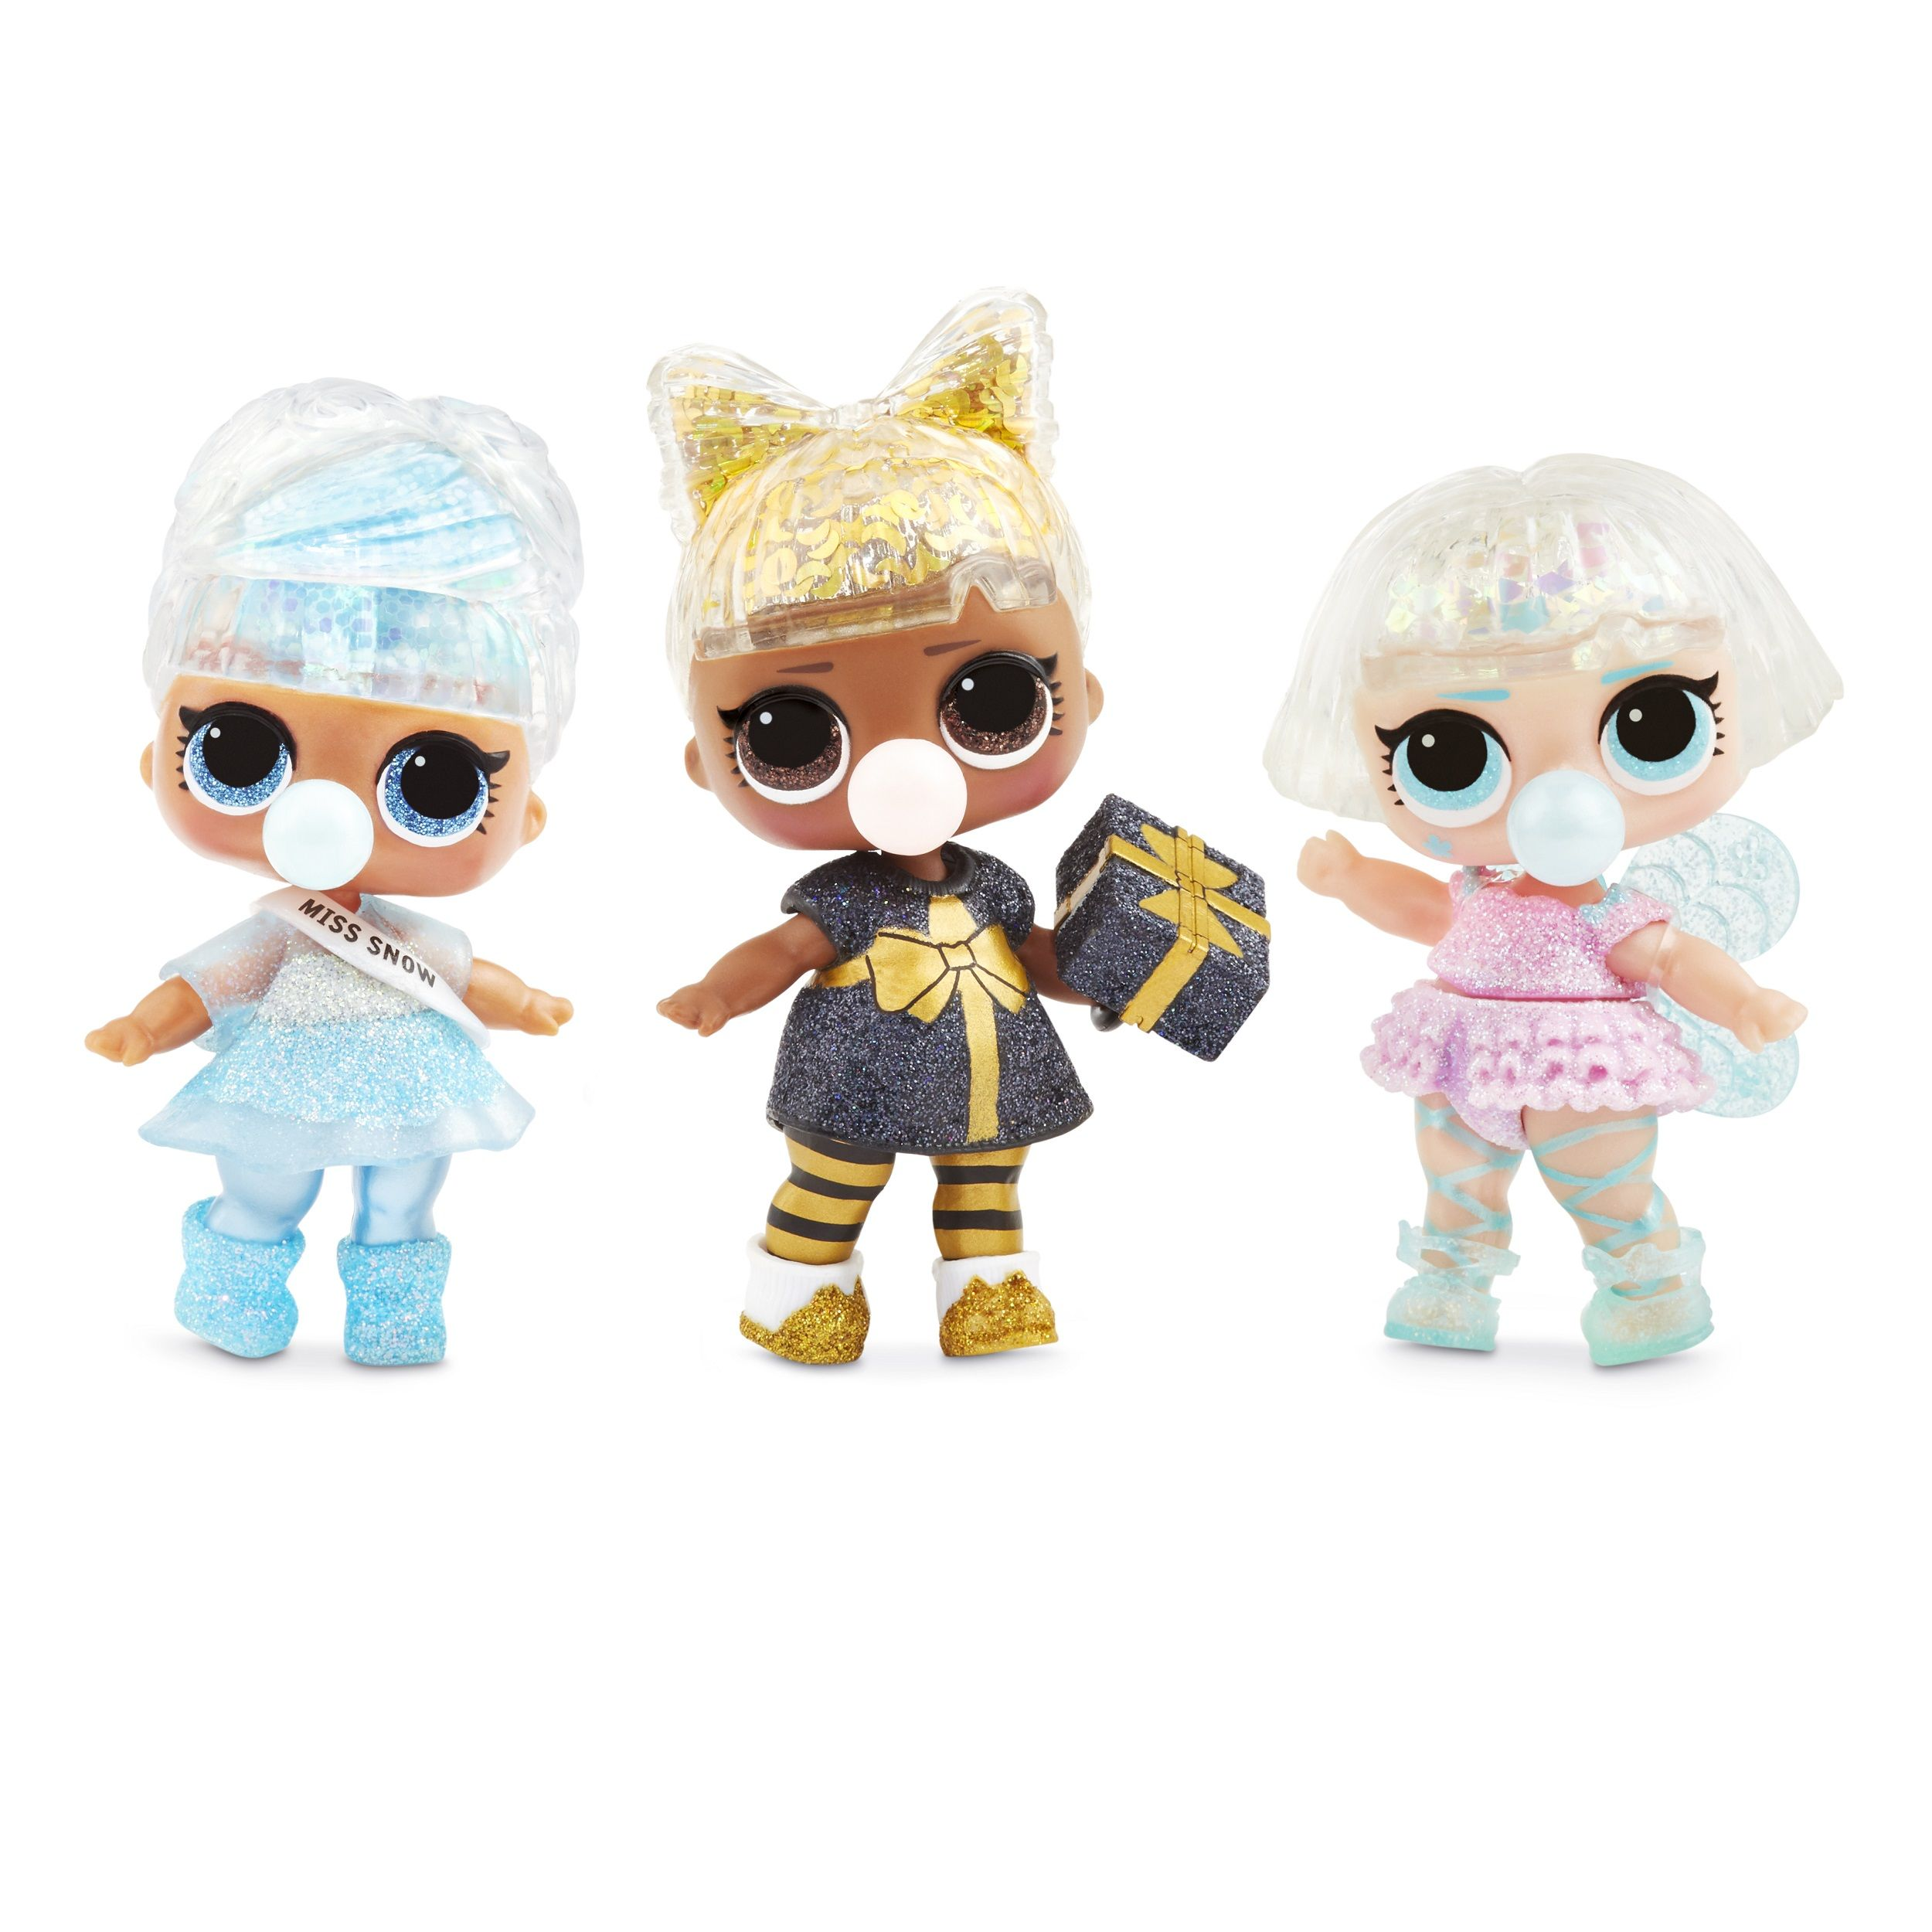 L O L Surprise 2 In 1 Glamper Fashion Camper With 55 Surprises Walmart Com Lol Dolls Kitty Glitter Globes